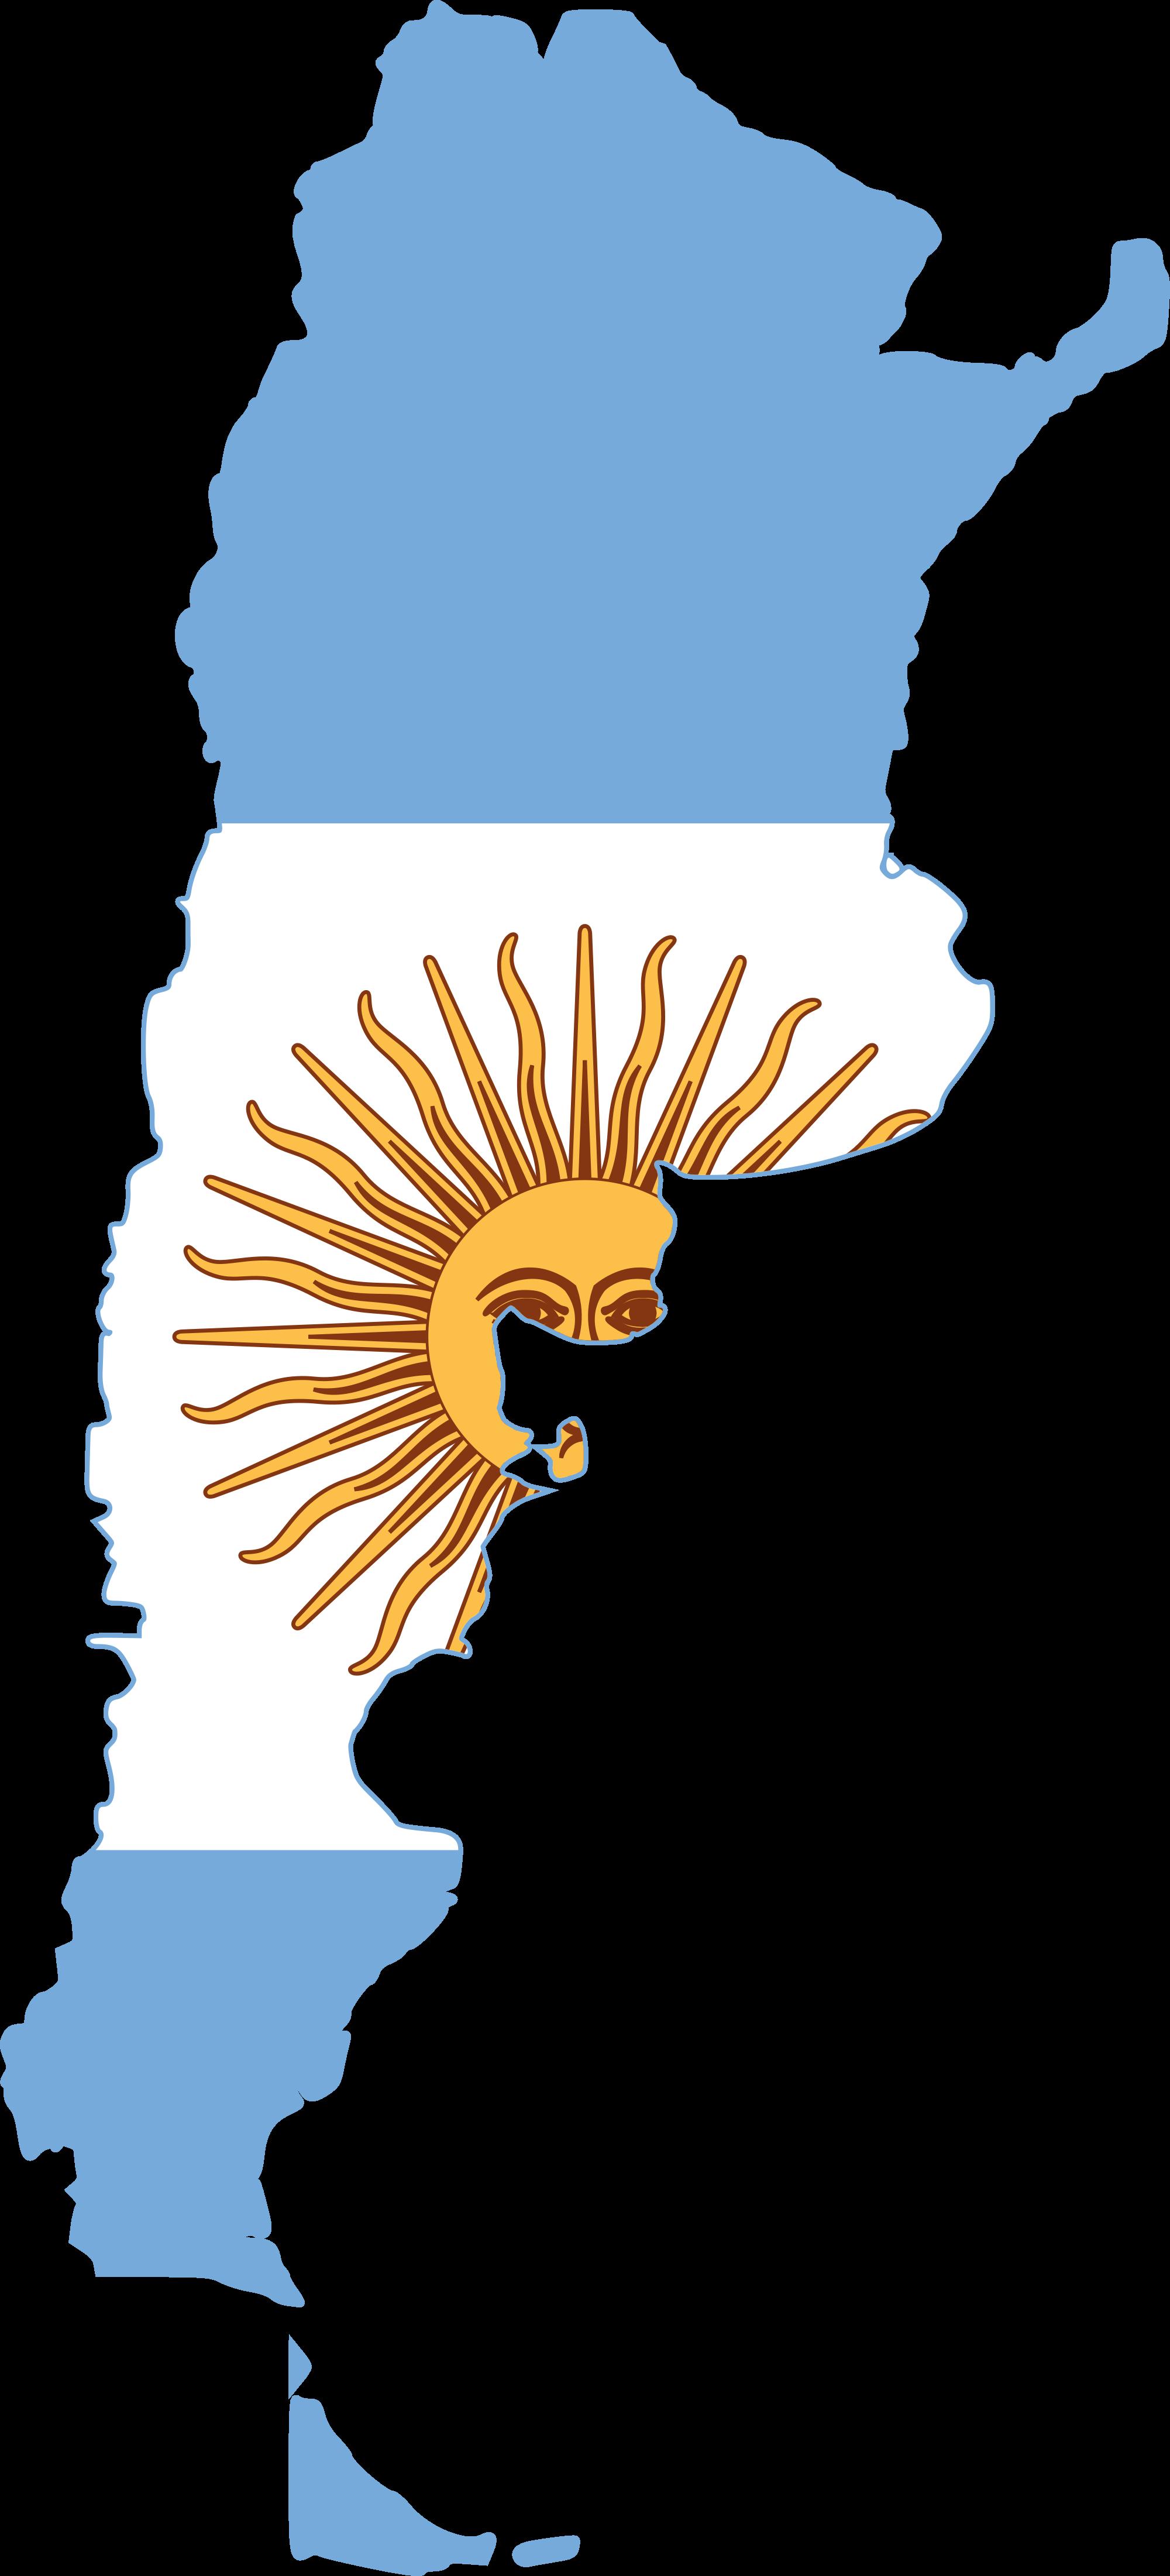 Argentina clipart Argentina Map Clipart #8